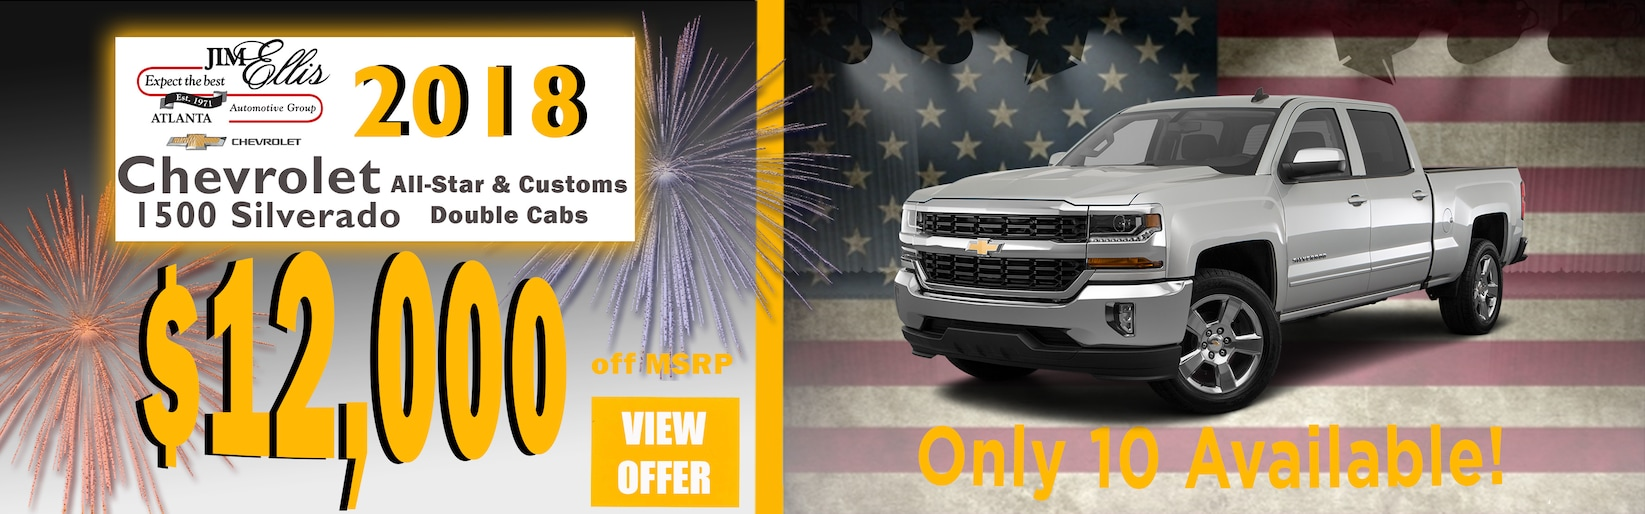 Jim Ellis Chevrolet Atlanta | New & Used Chevy Car Dealer ...